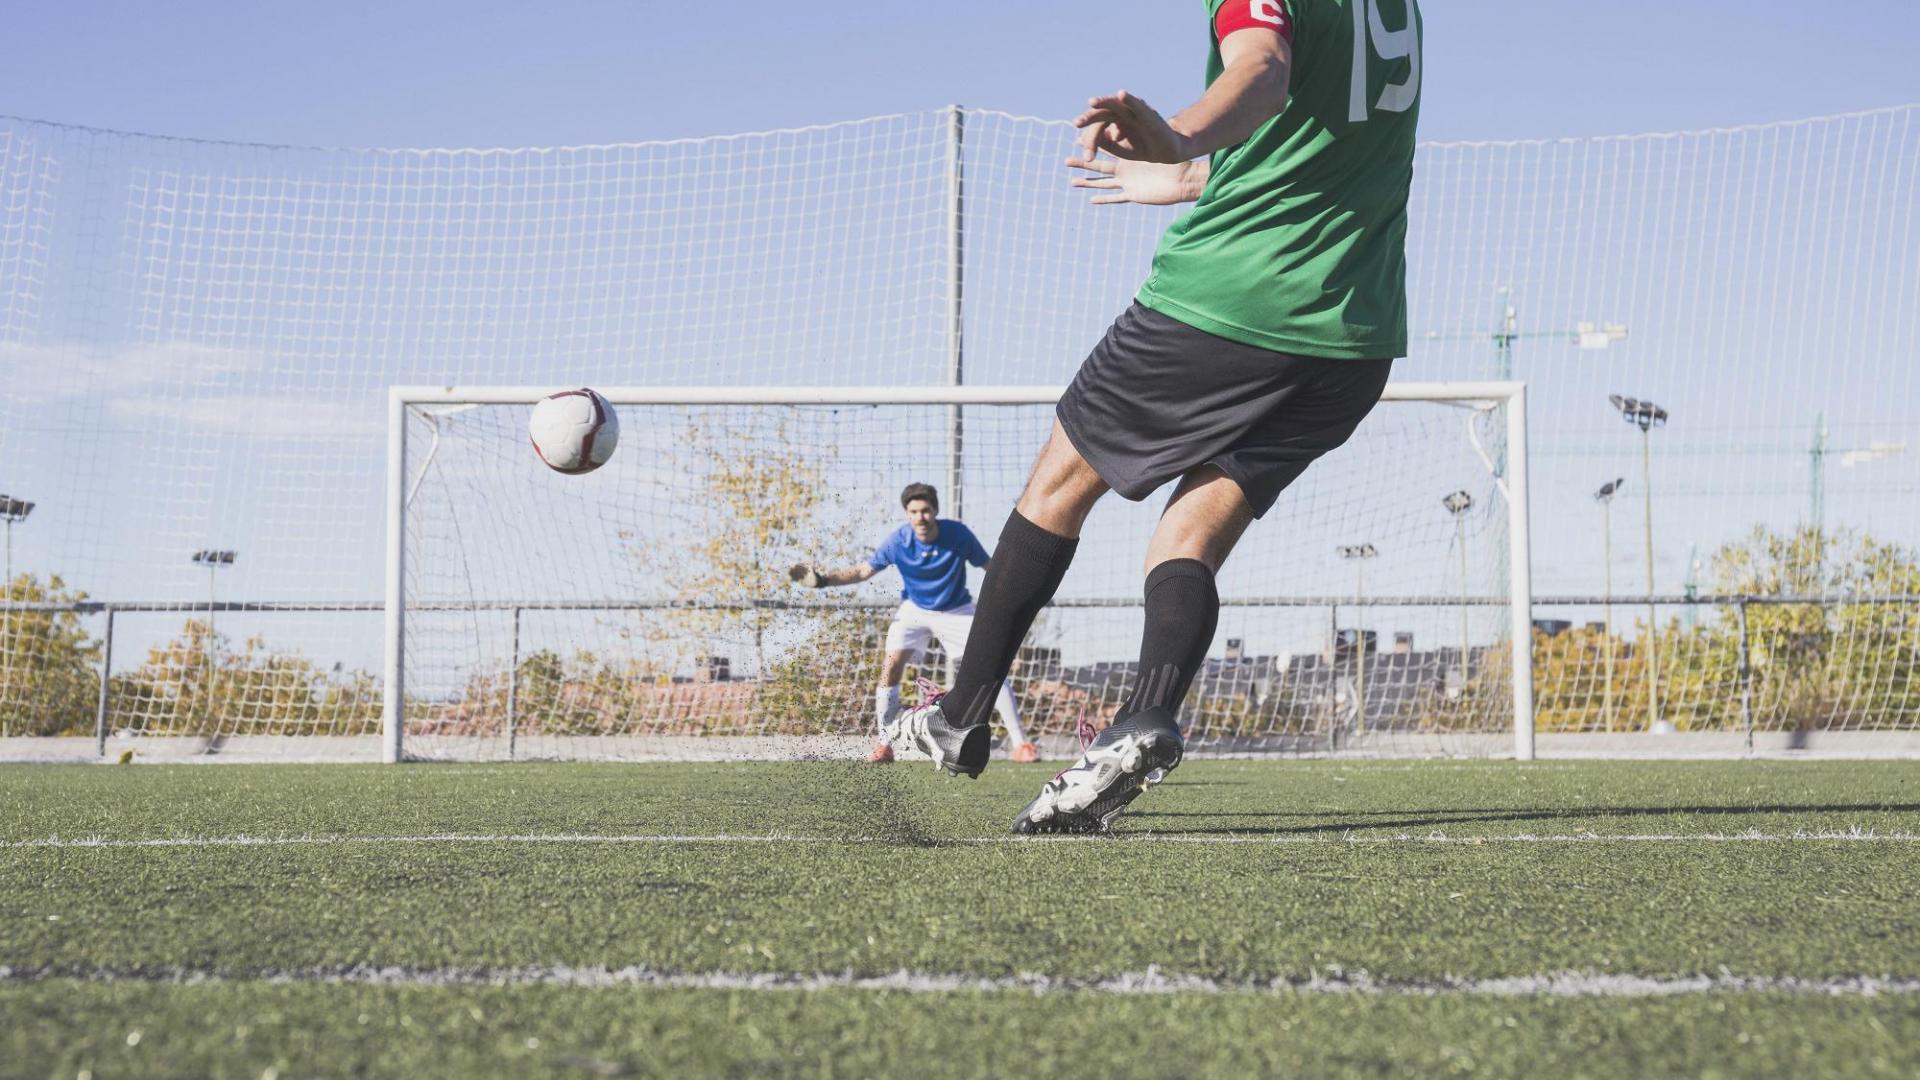 Mann Fußball